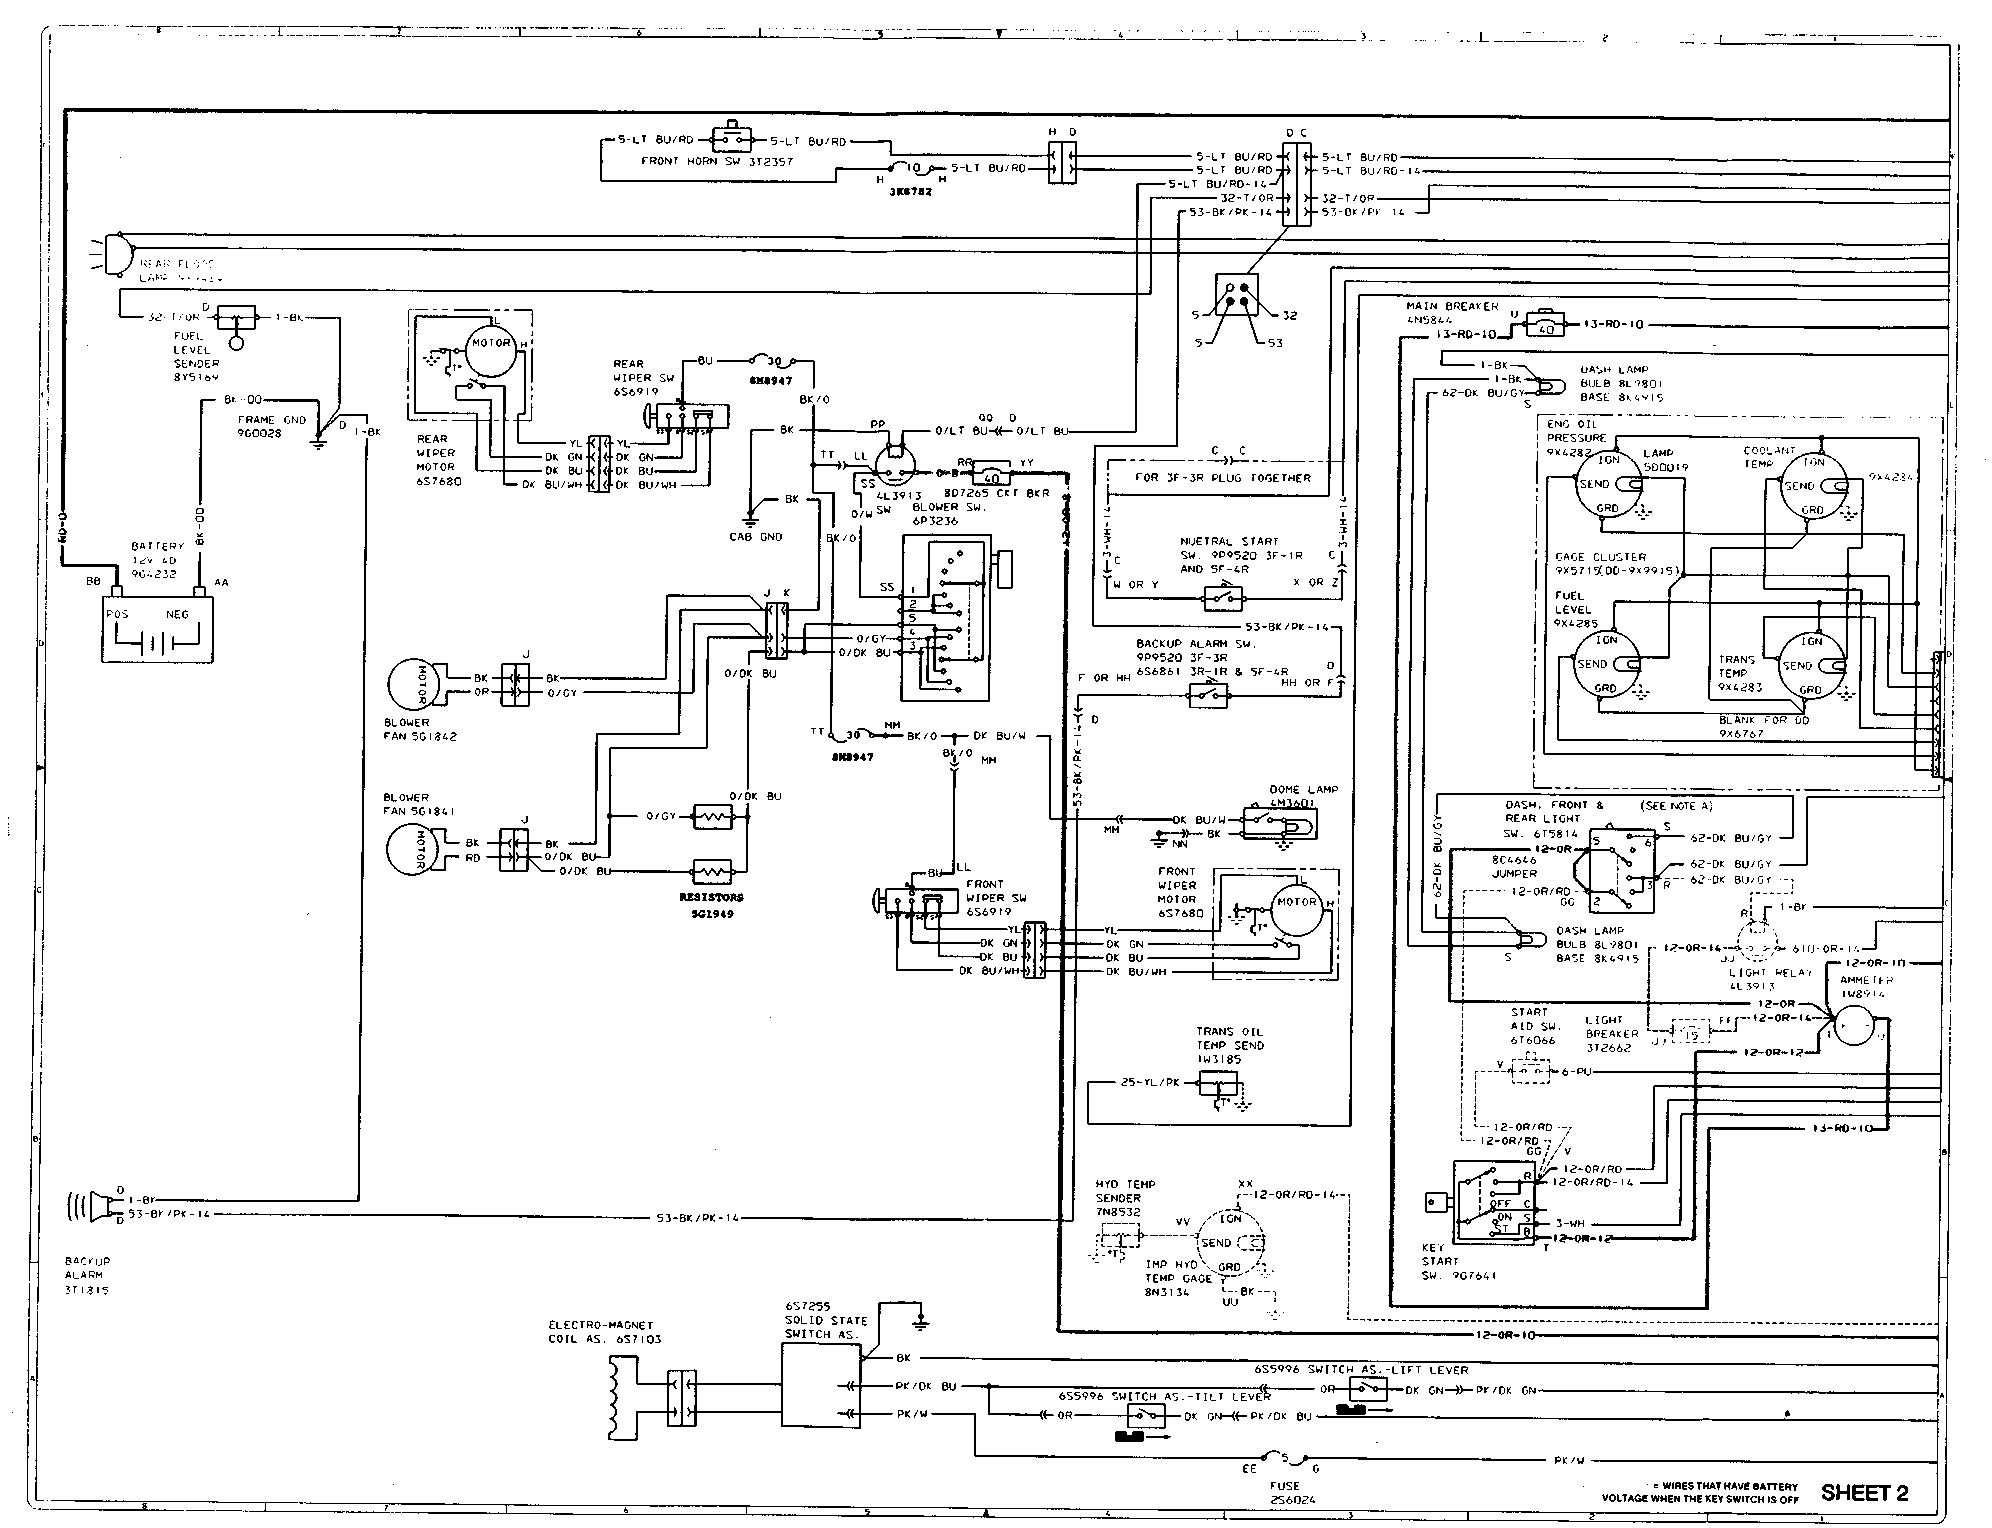 Diagram Cat 246 Wiring Diagram Full Version Hd Quality Wiring Diagram Okwiring18 Lasagradellacastagna It